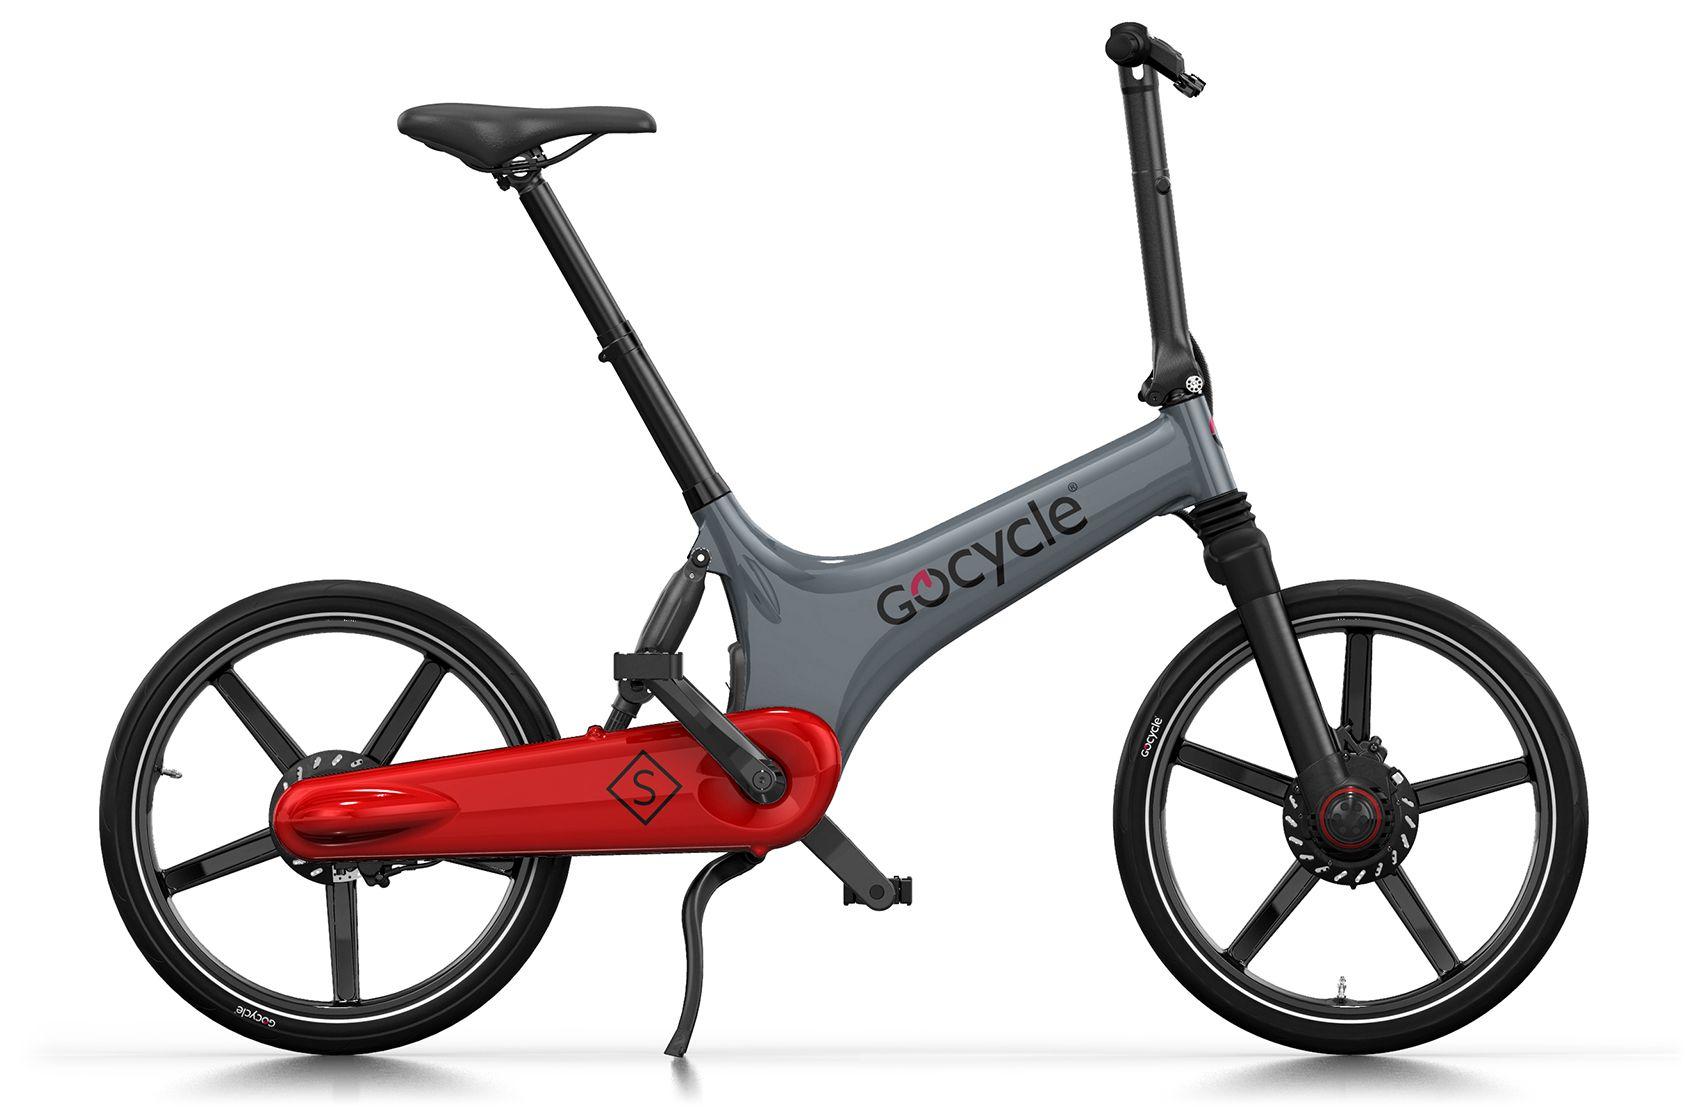 Gocycle GS